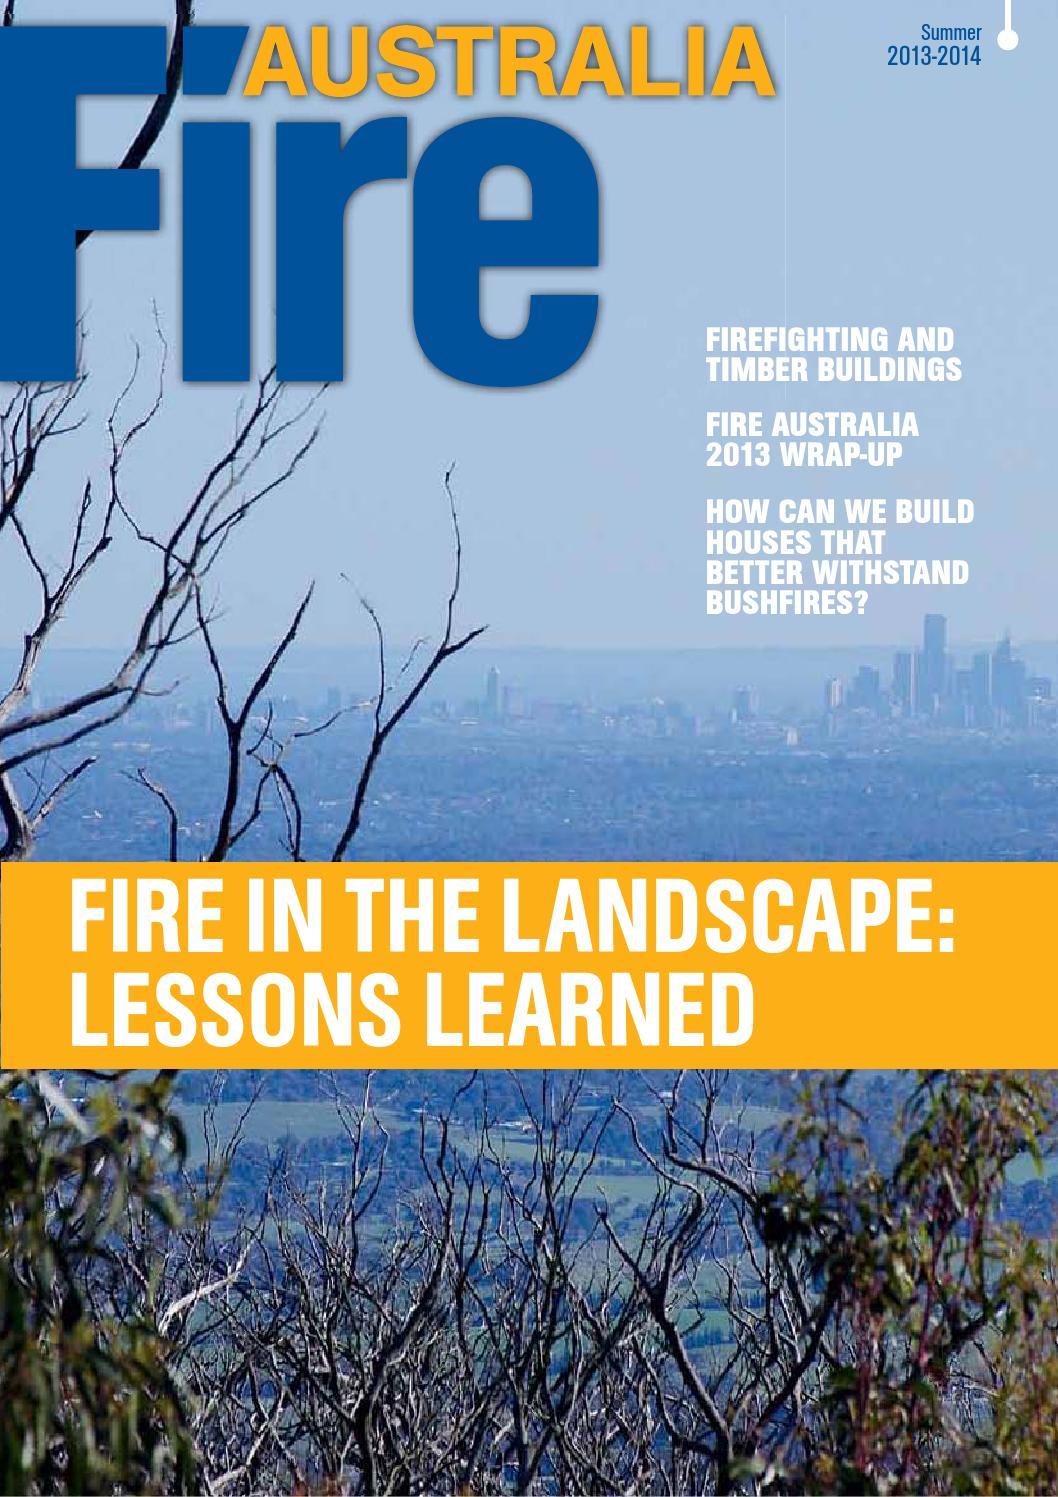 Fire Australia Summer 2013-2014 by AFAC - issuu